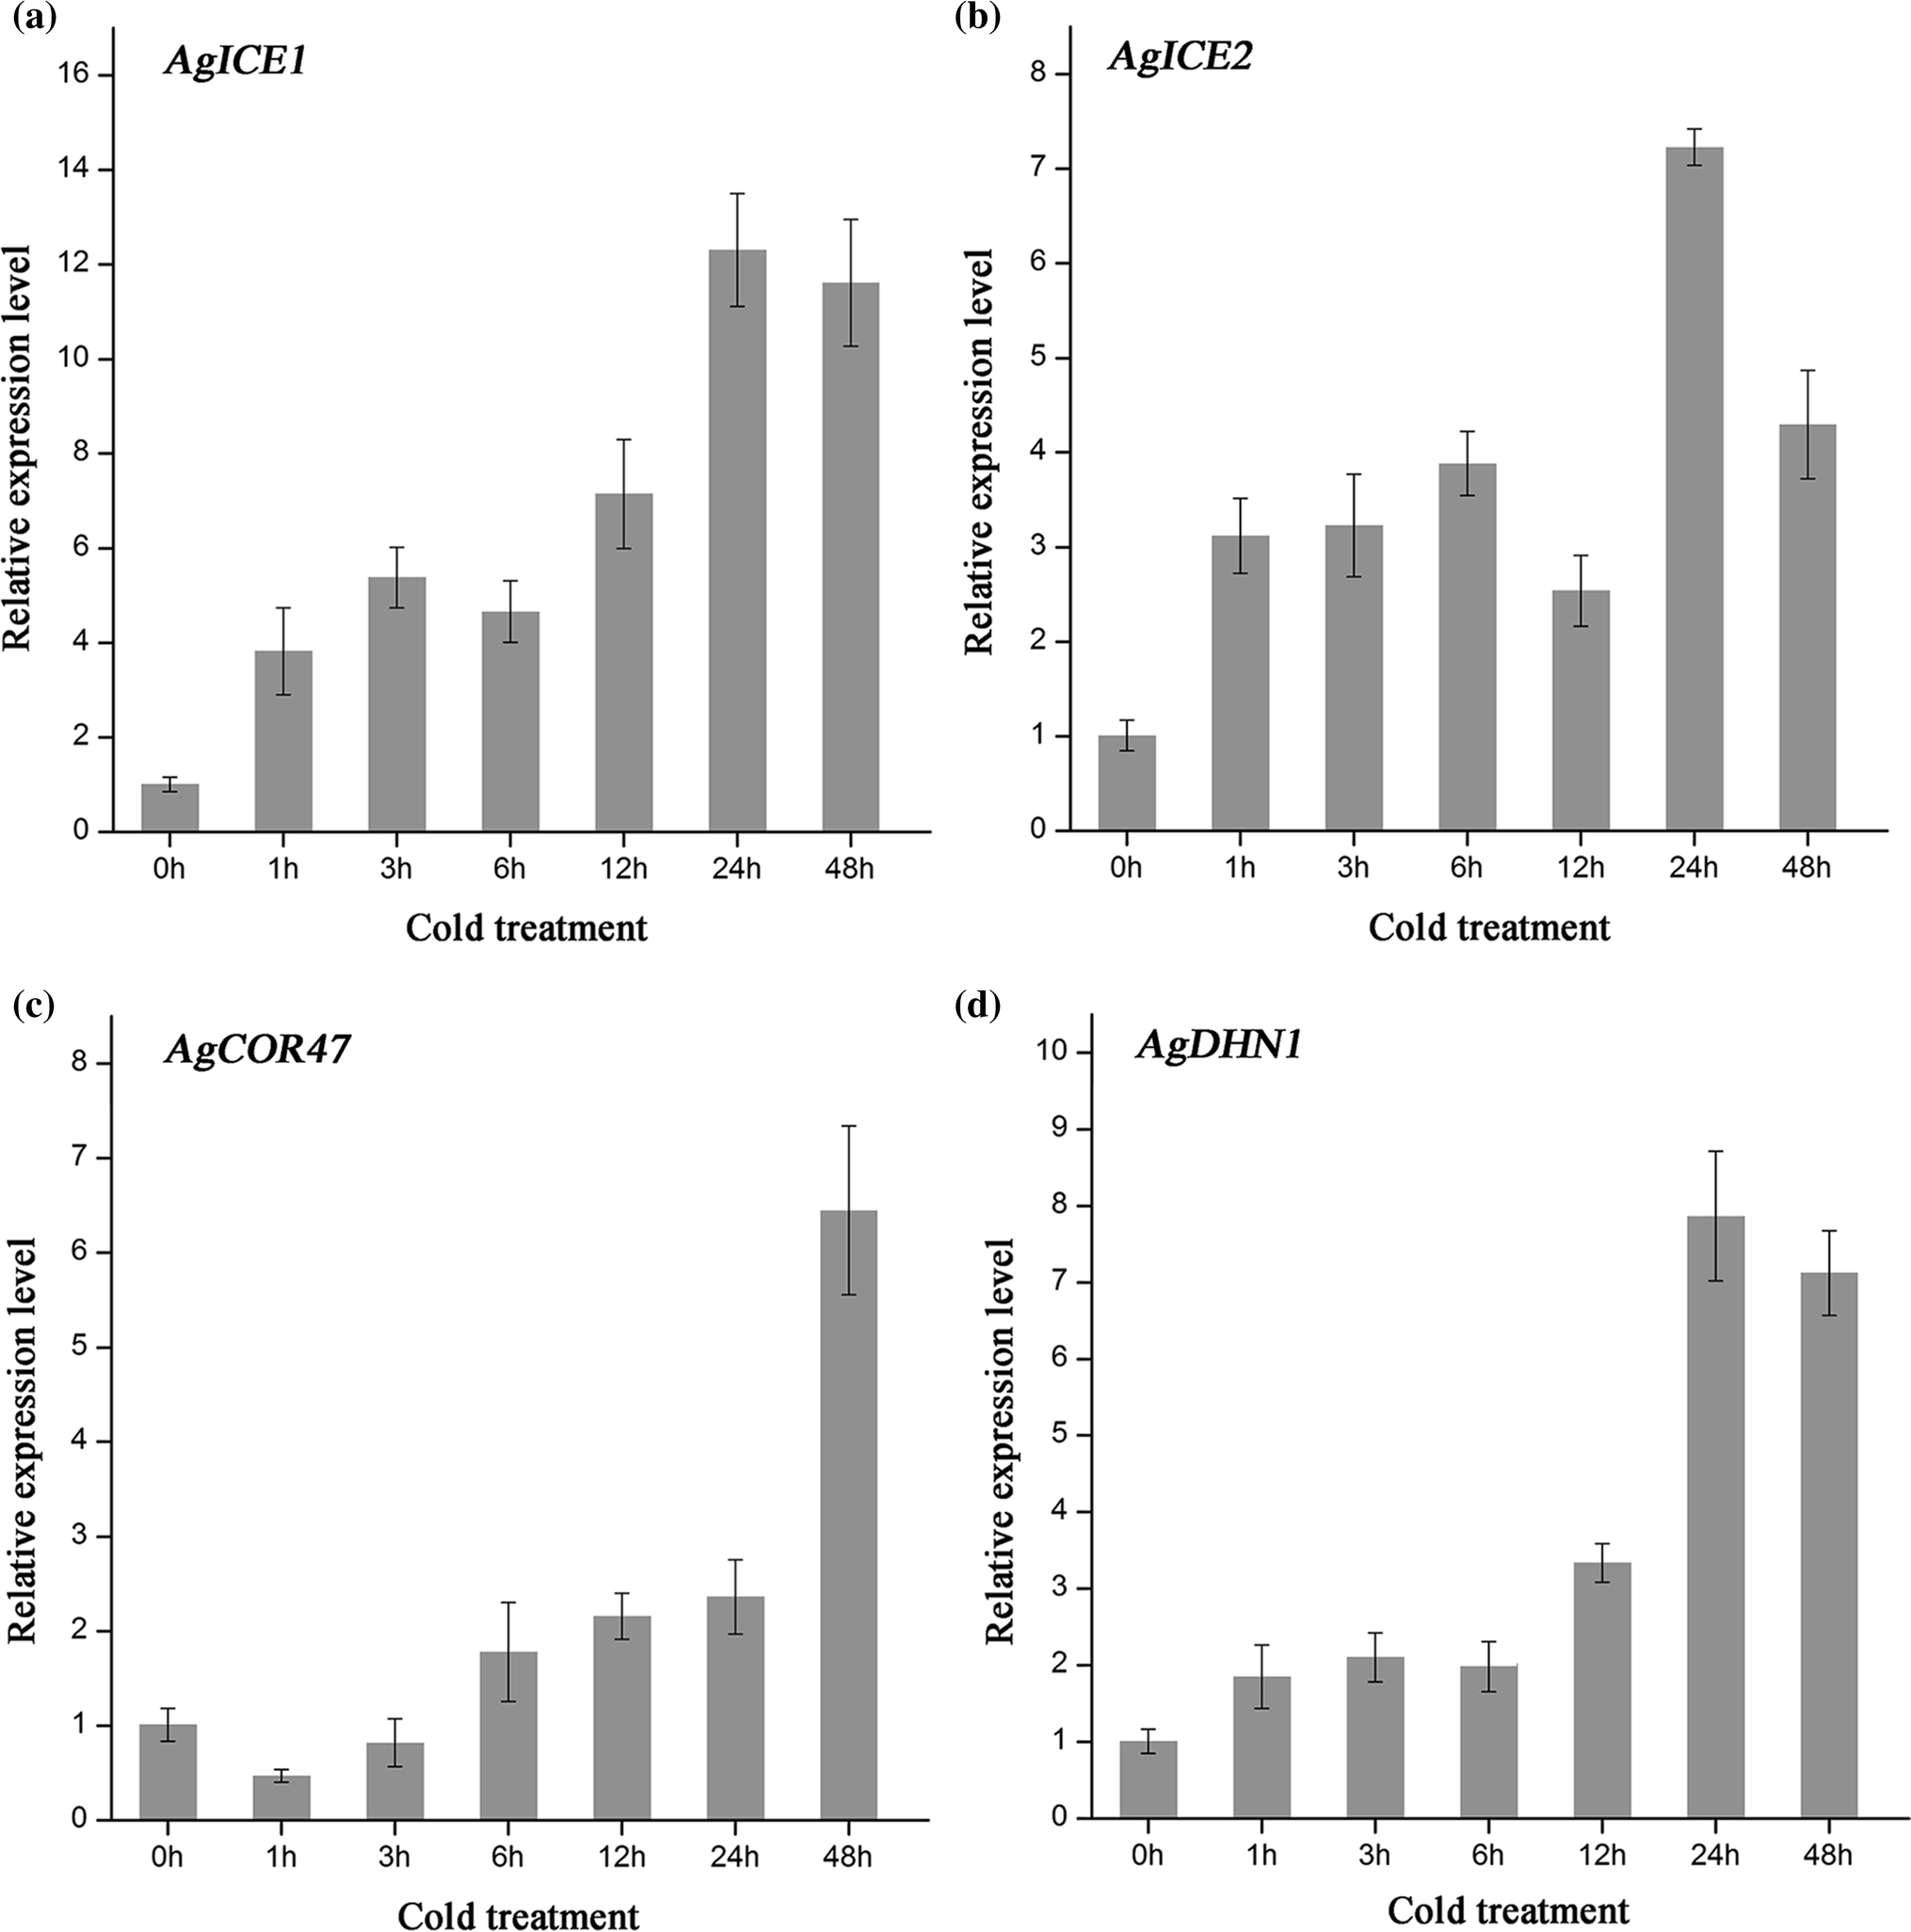 Genomic identification of AP2/ERF transcription factors and